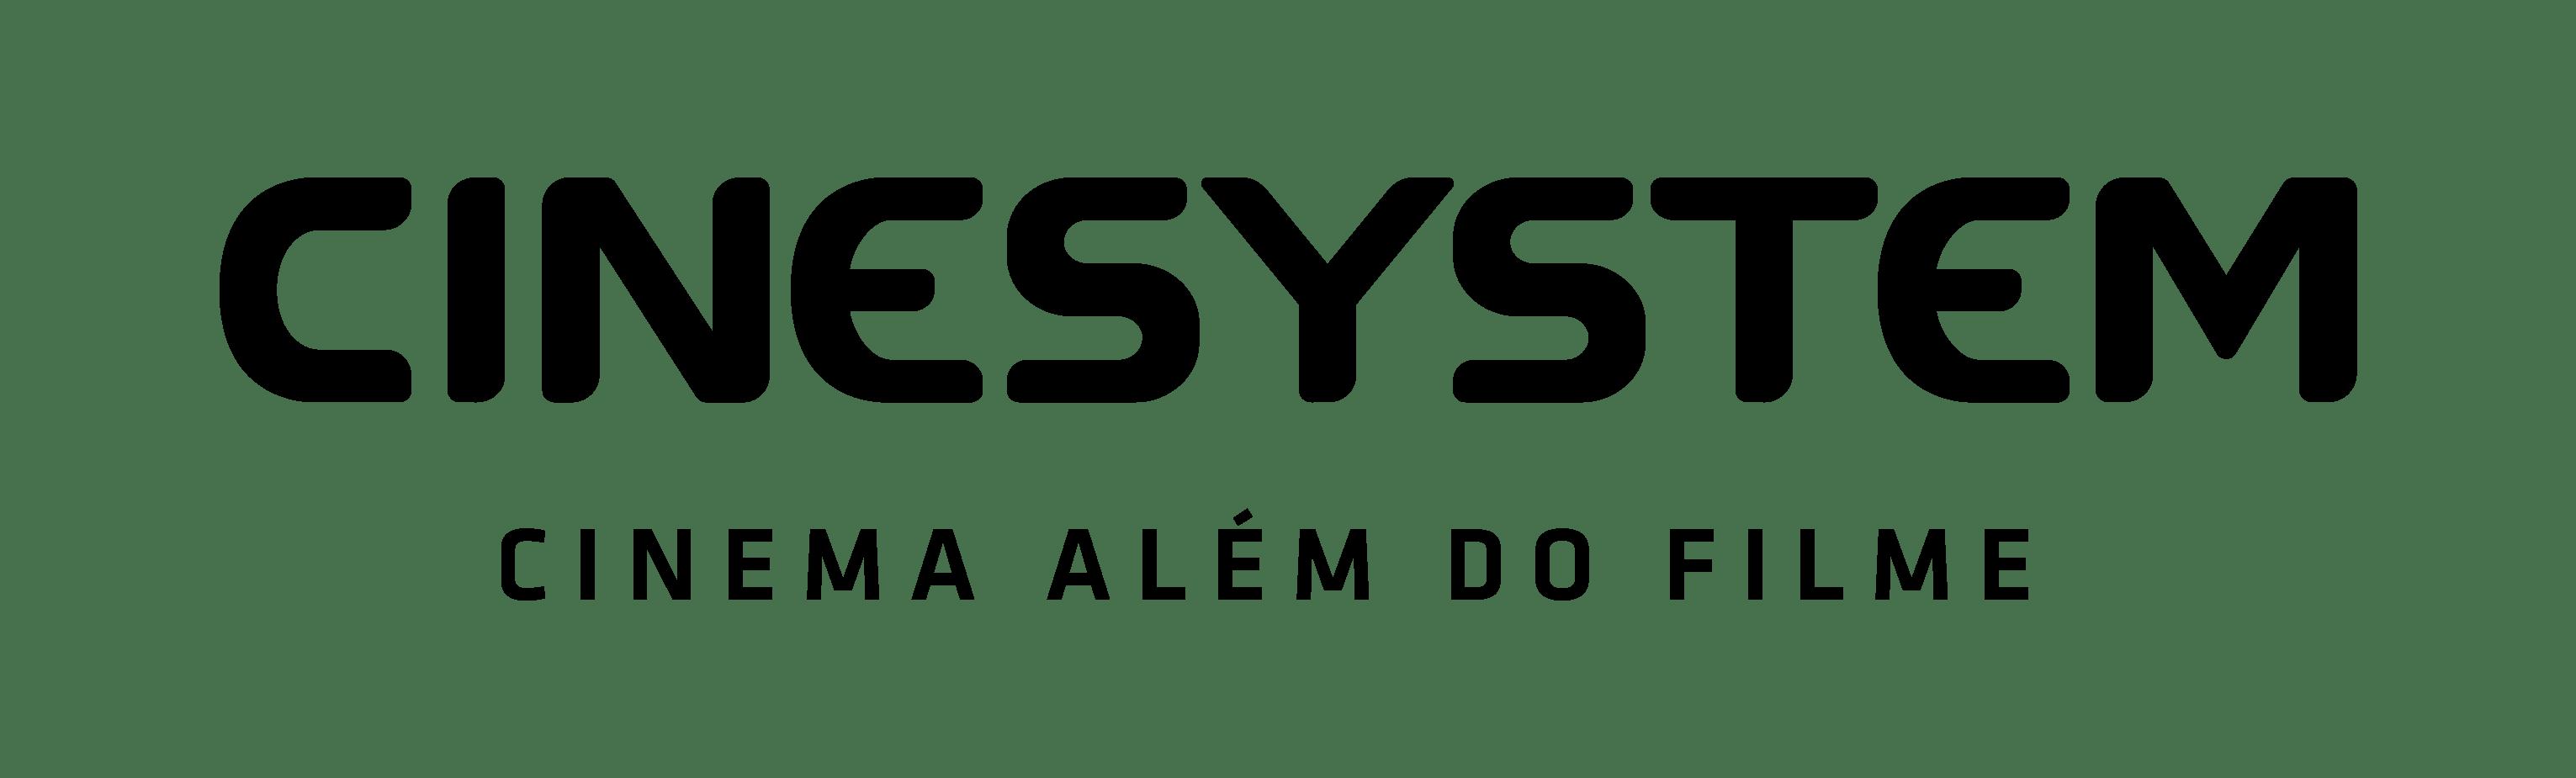 Cinesystem - Preta-01 (1)